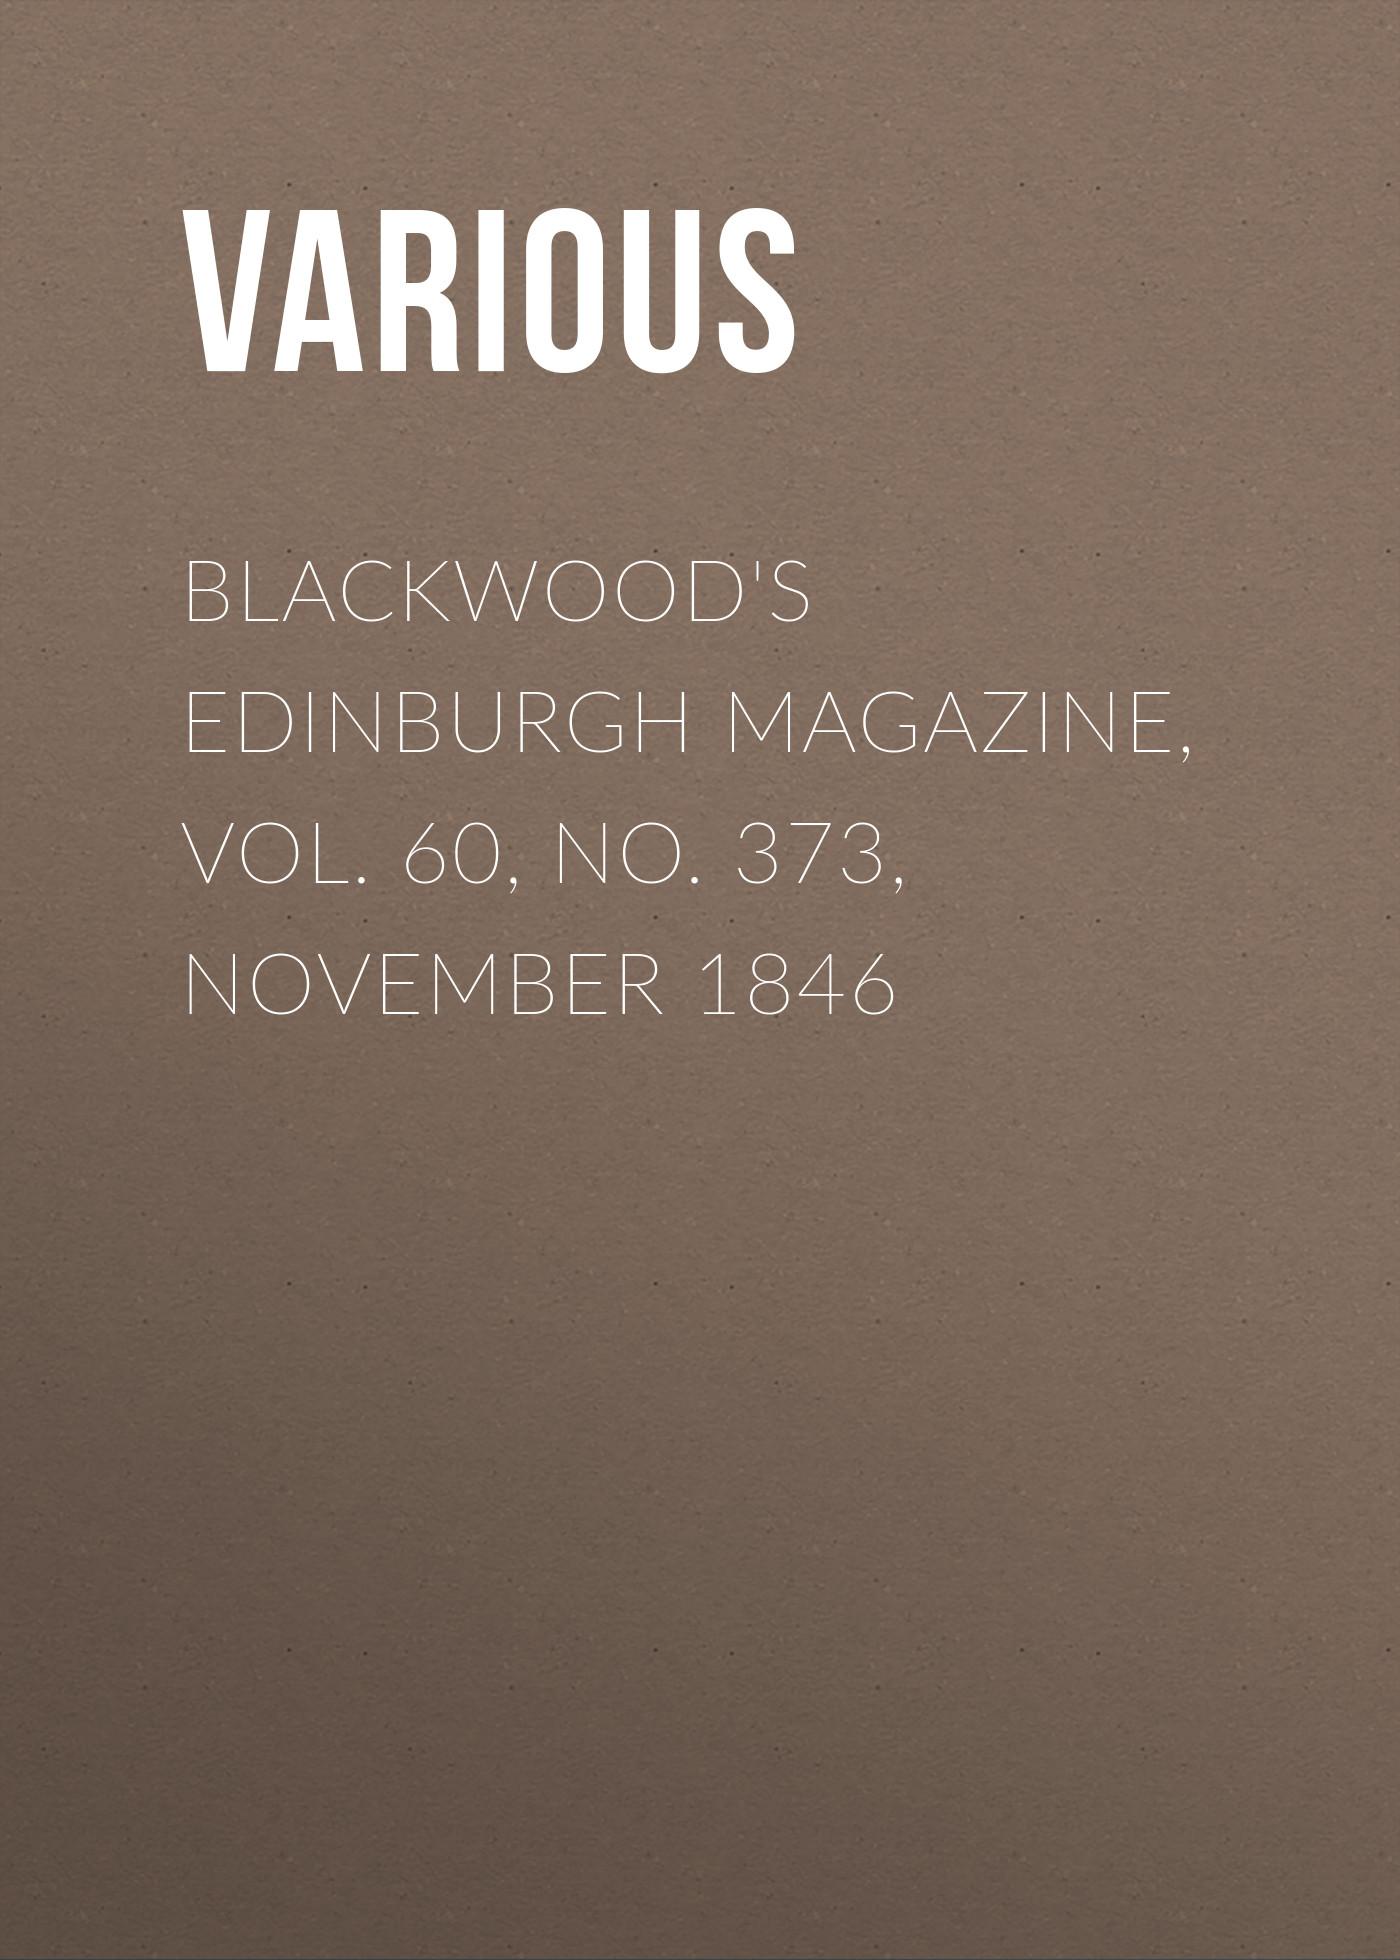 Various Blackwood's Edinburgh Magazine, Vol. 60, No. 373, November 1846 various blackwood s edinburgh magazine volume 62 number 385 november 1847